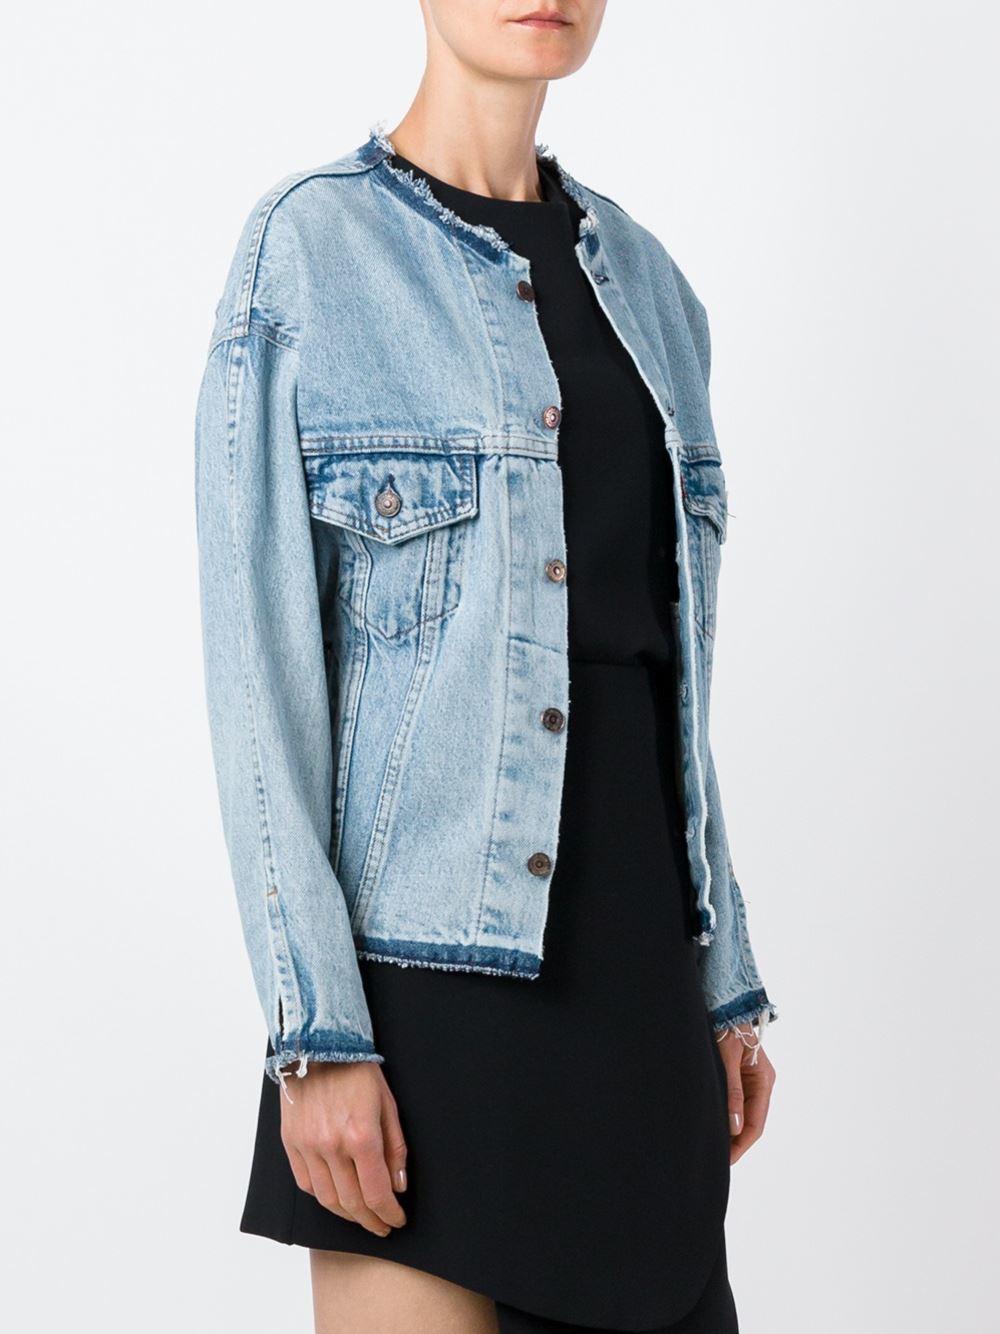 White Levi Jeans For Women